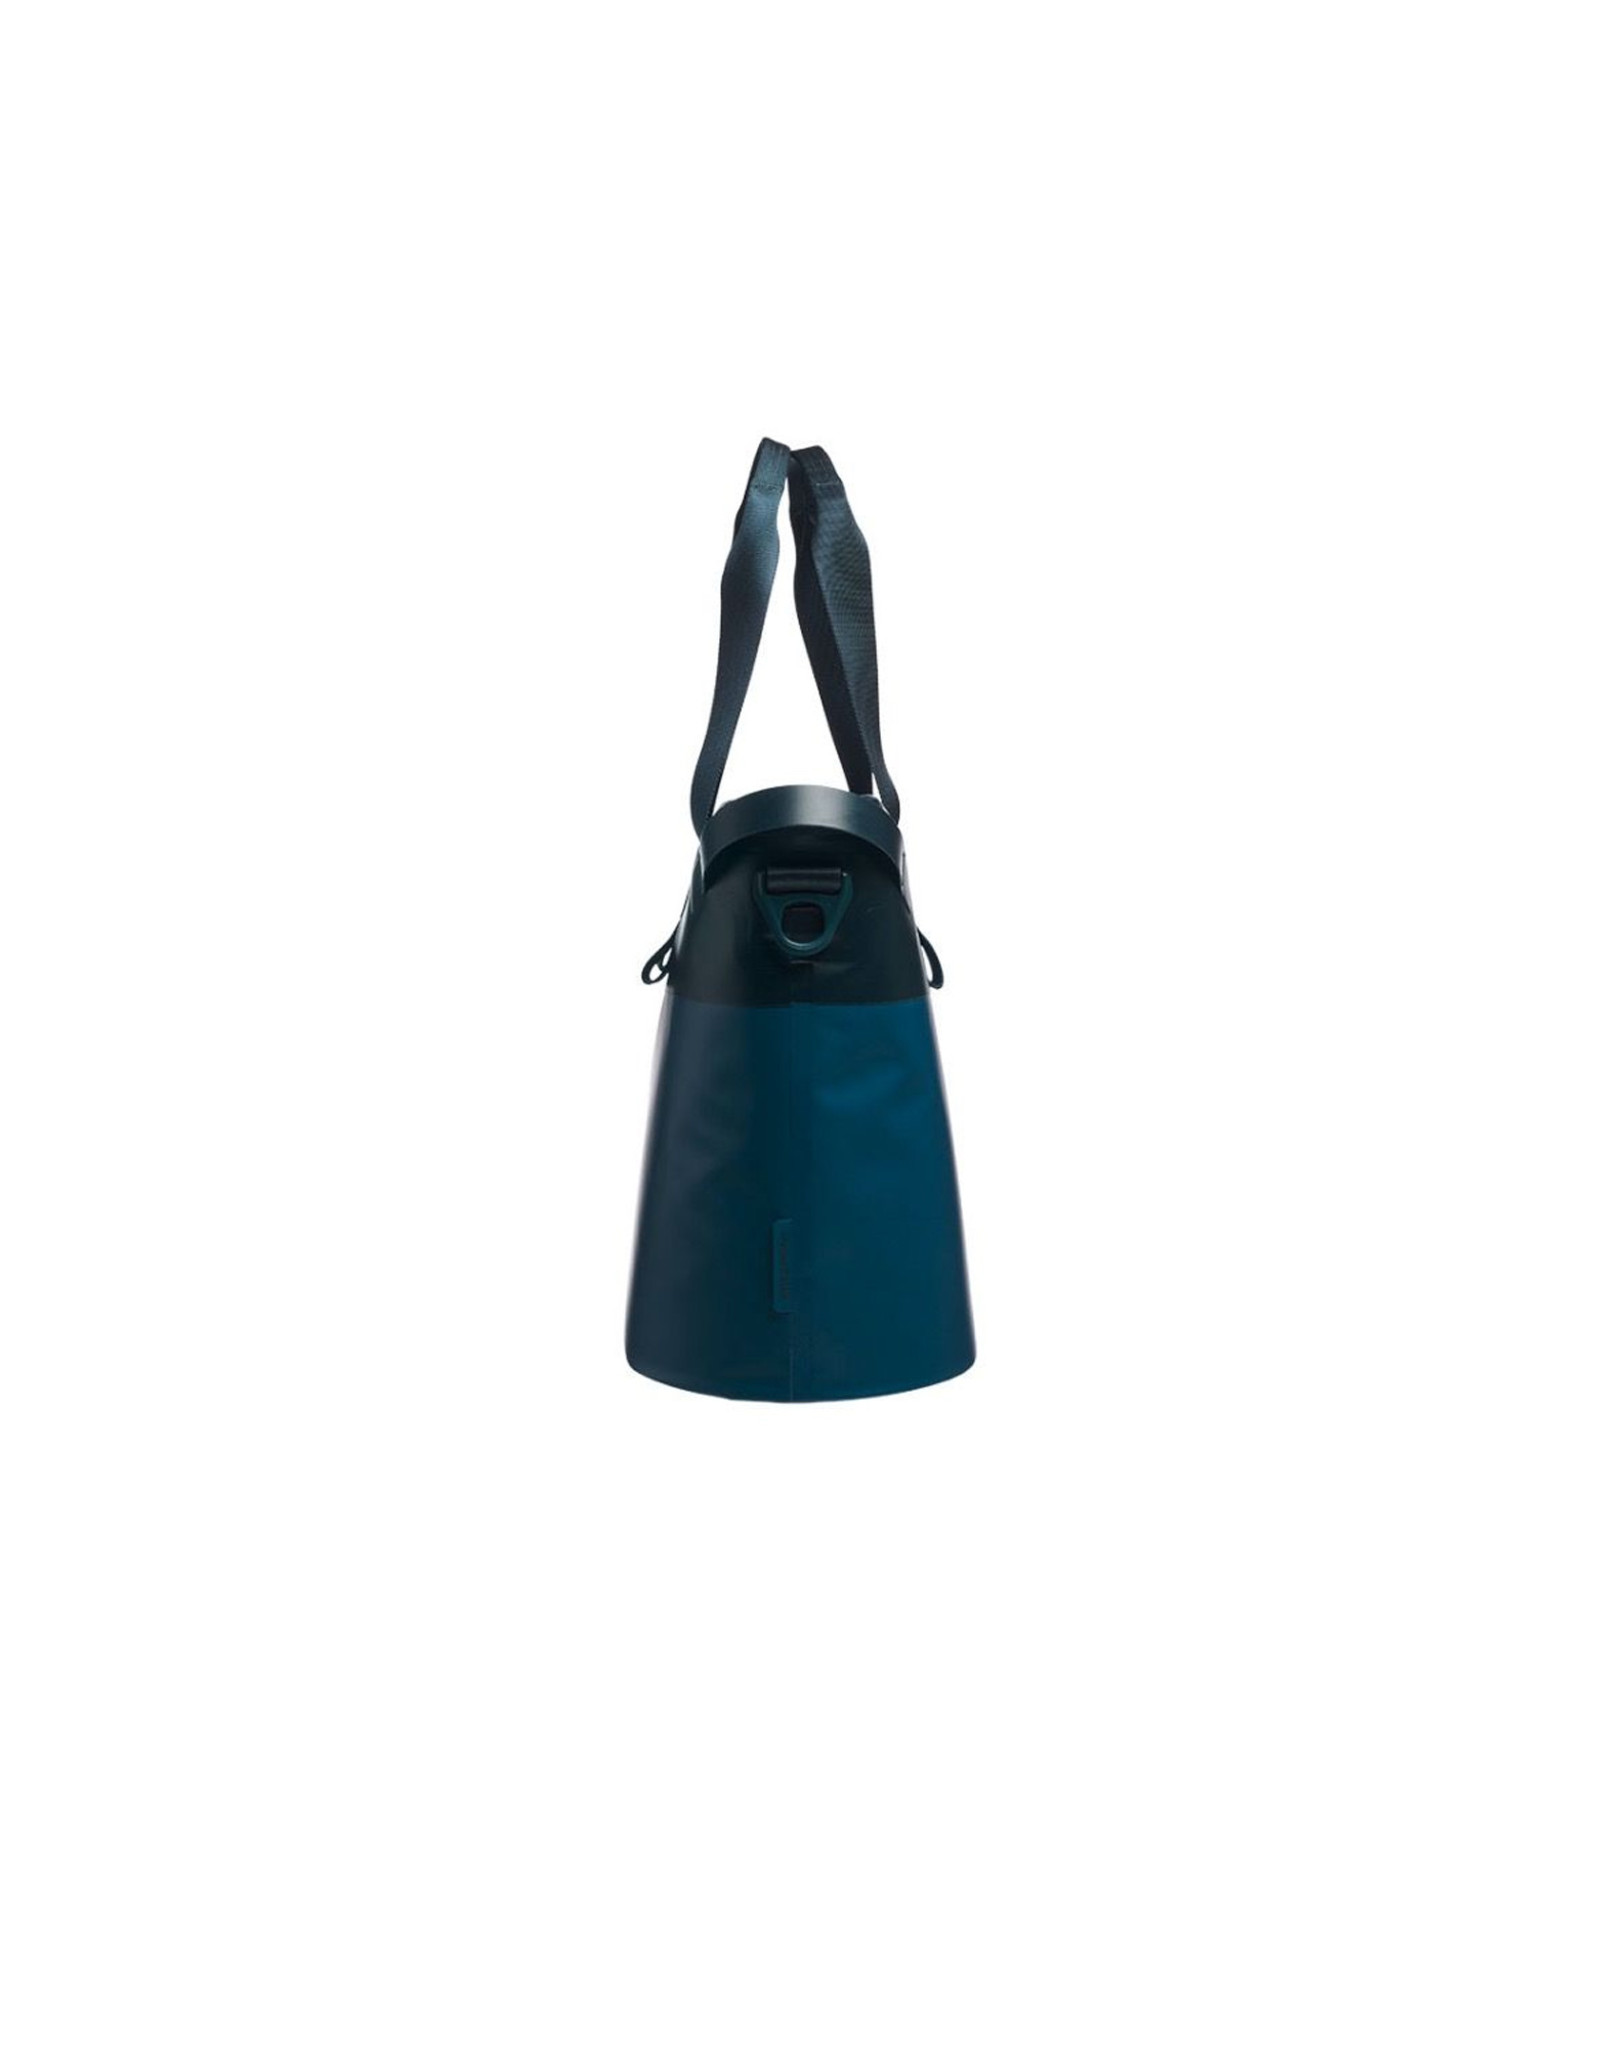 Hydro flask Soft Cooler Hydro Flask 18L